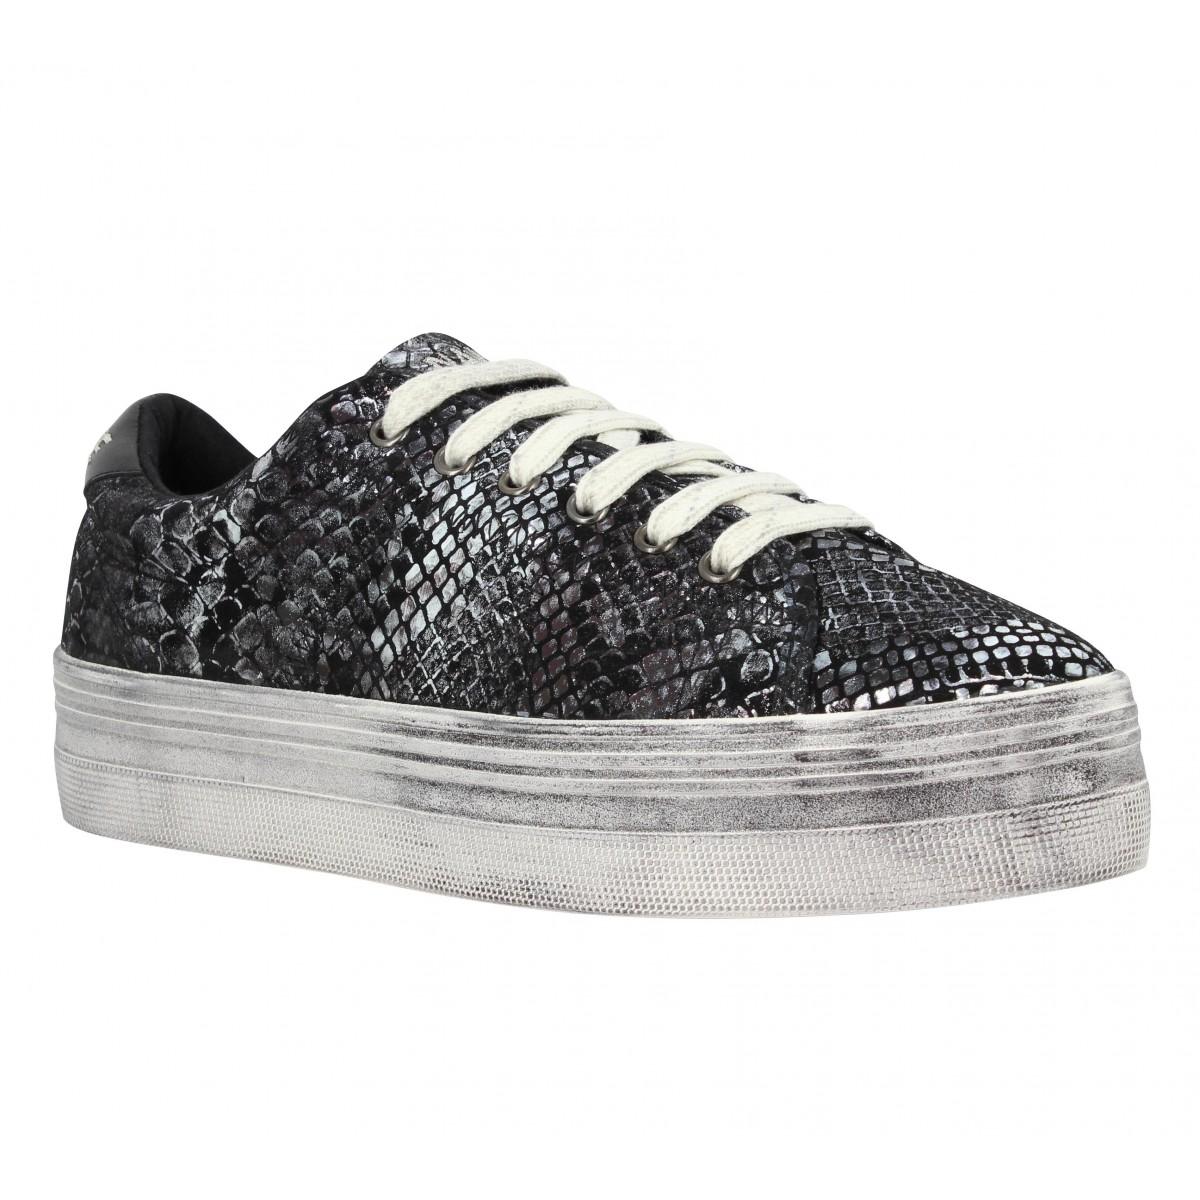 Compensées NO NAME Plato Sneaker shiny snake Femme Noir